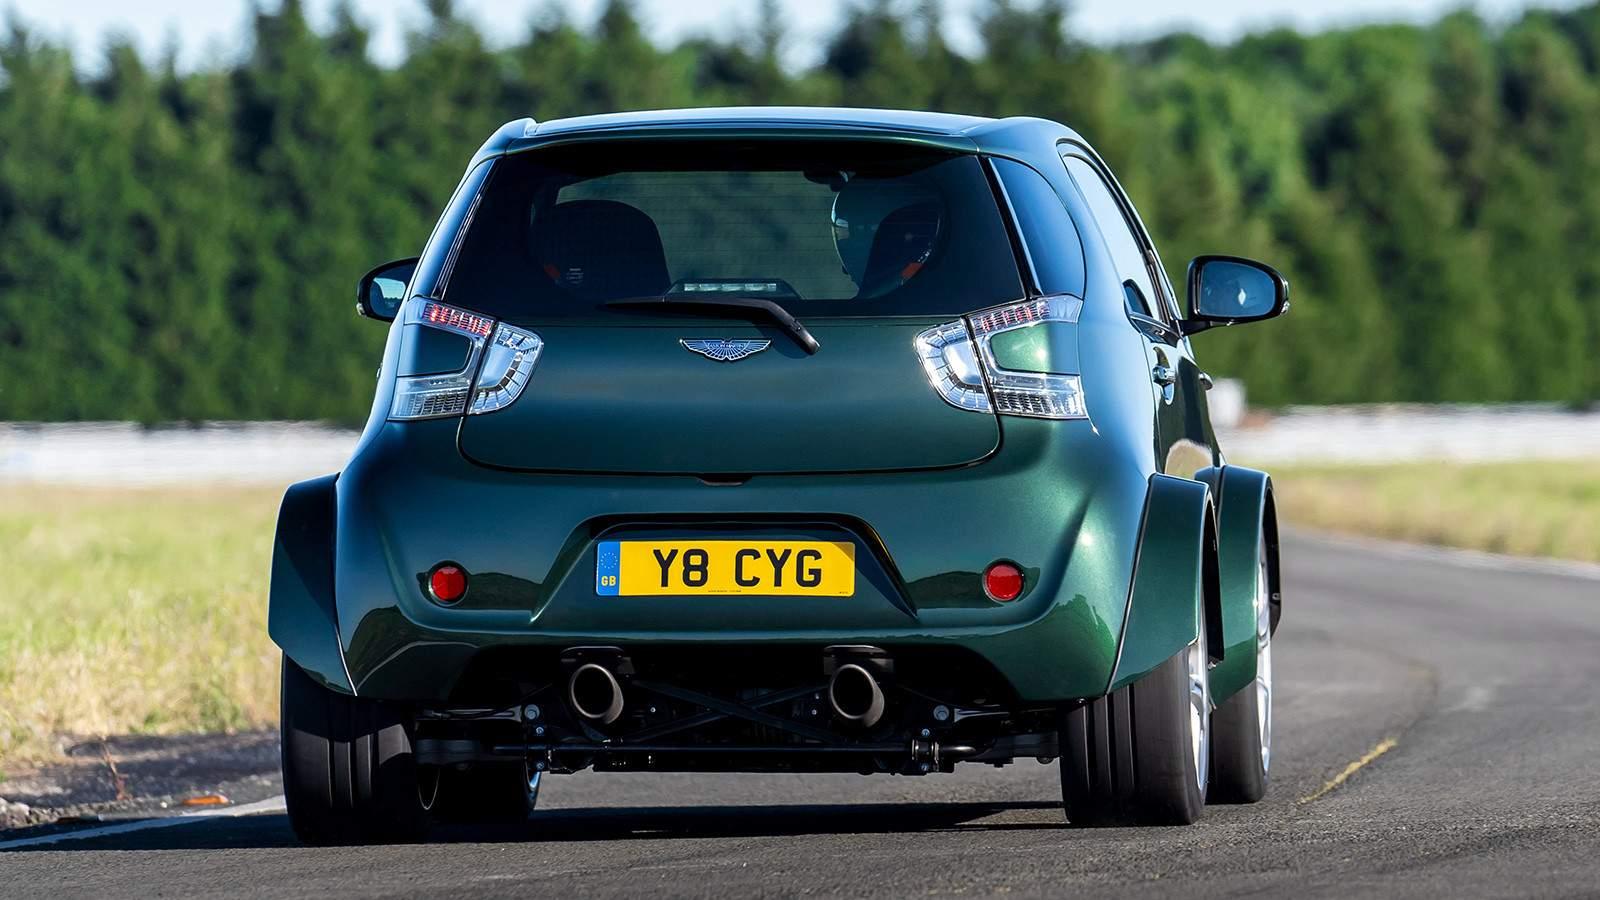 автомобиль Aston Martin вид сзади